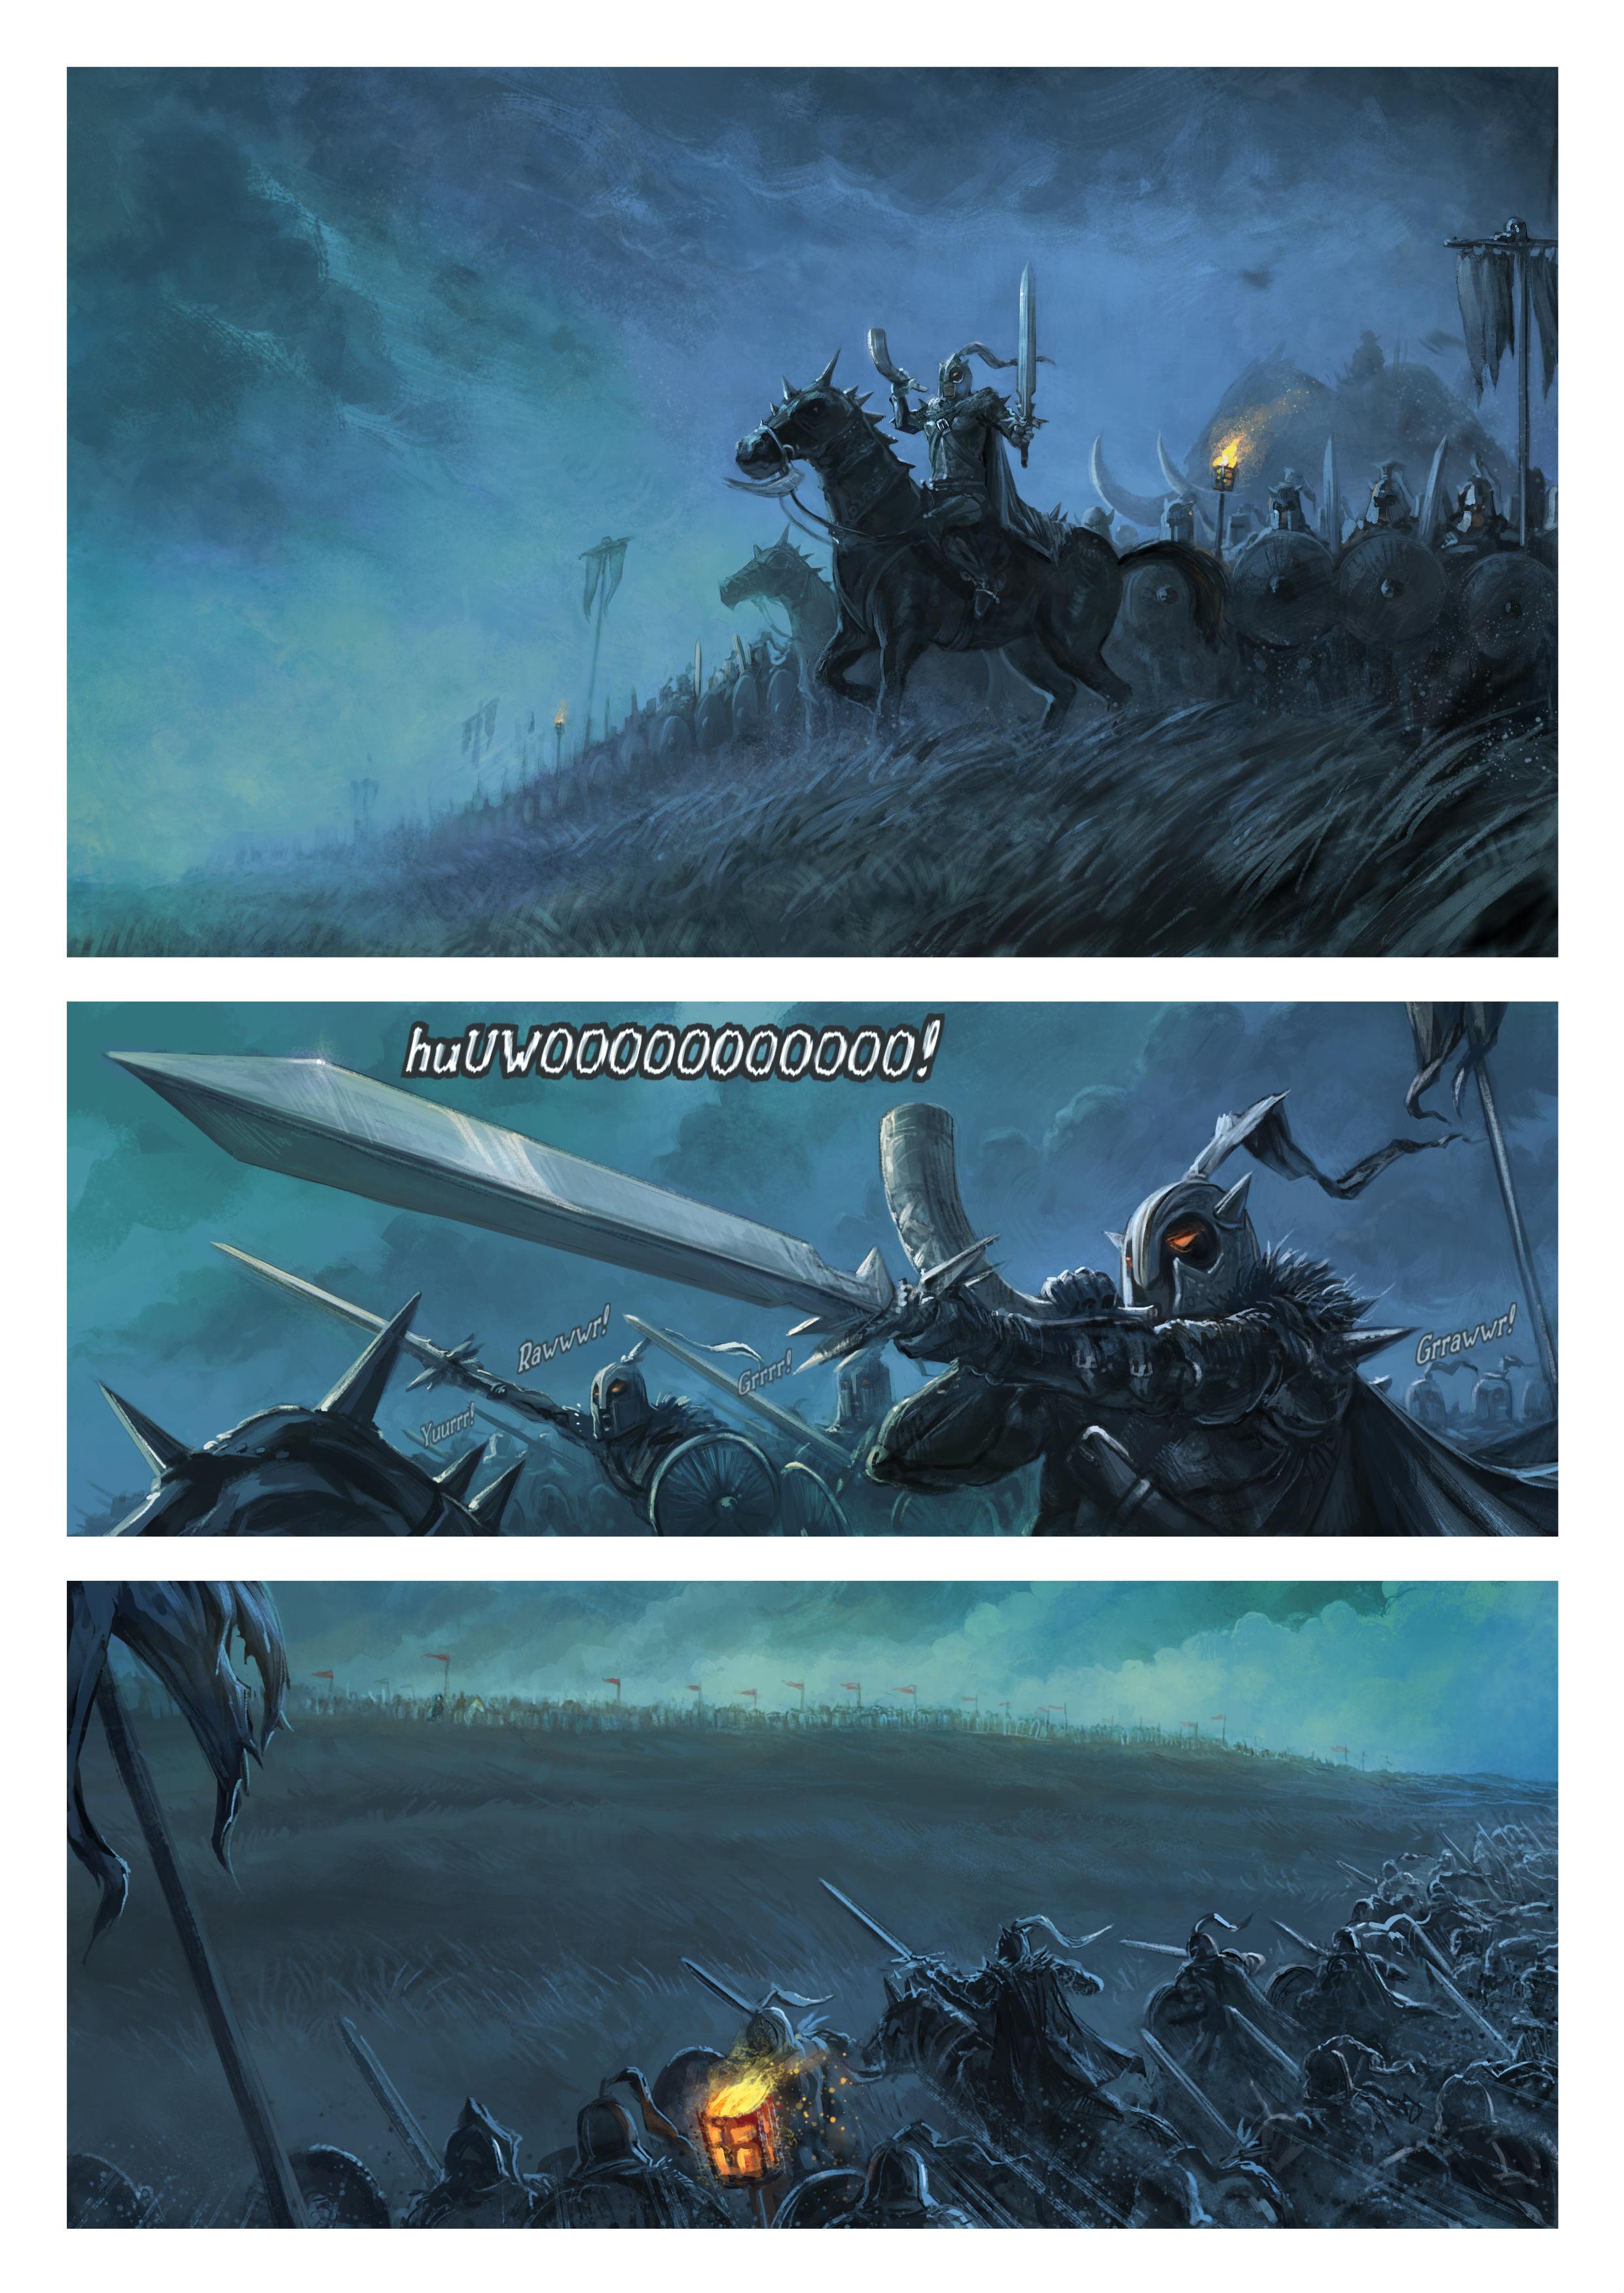 Episode 33: Krigsformelen, Page 1